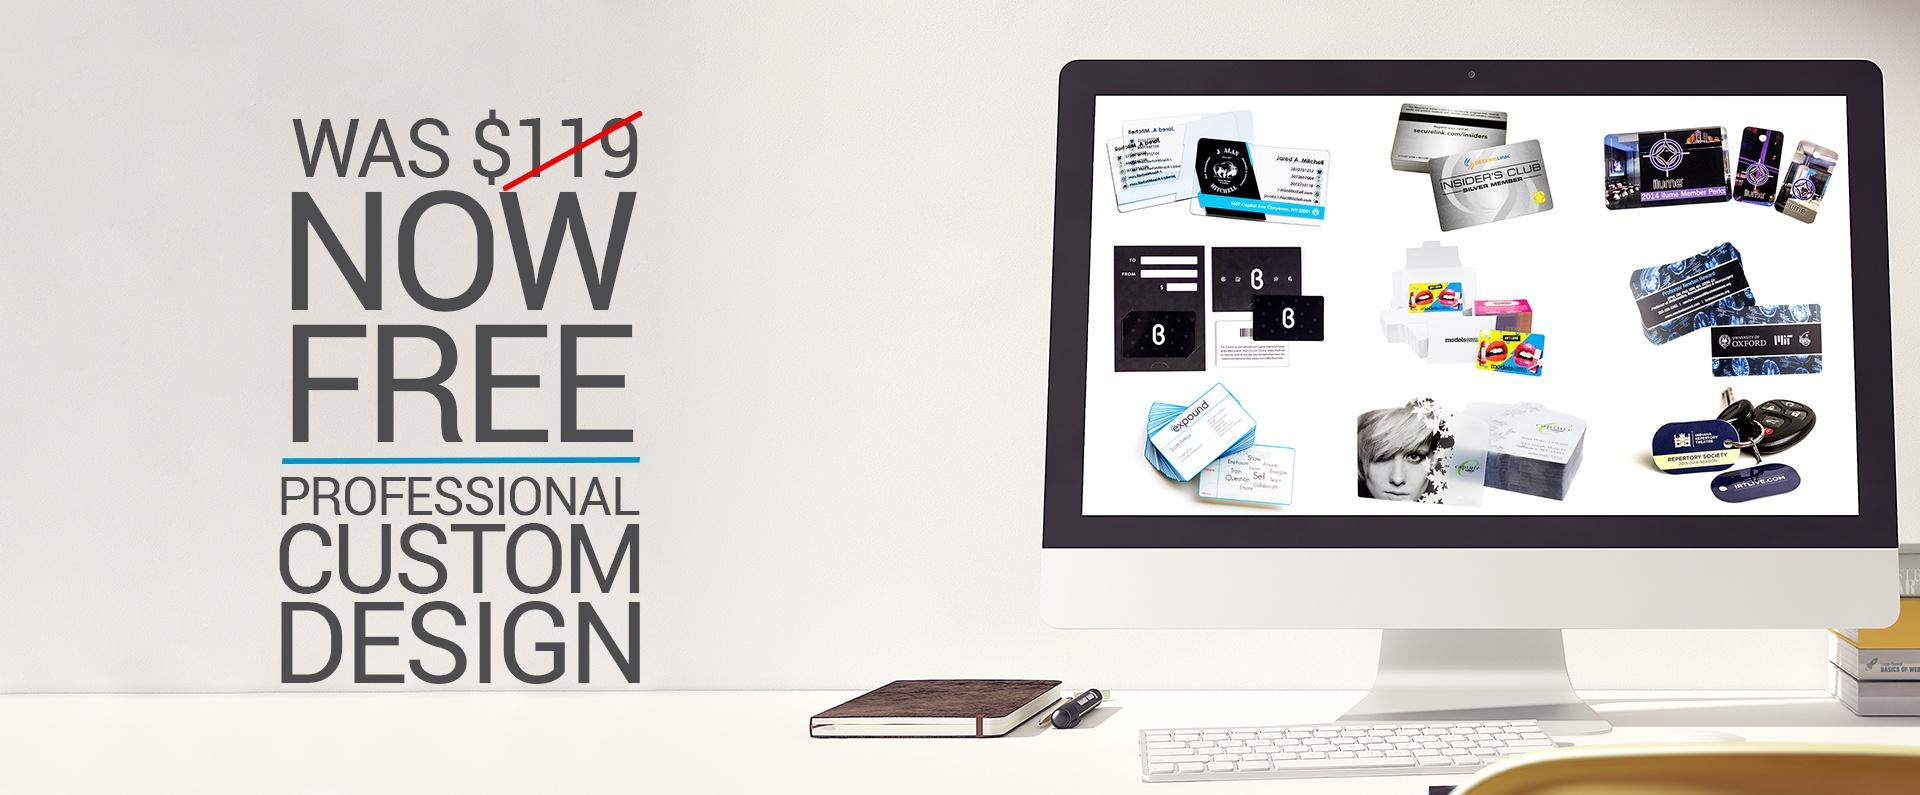 free custom plastic business card design